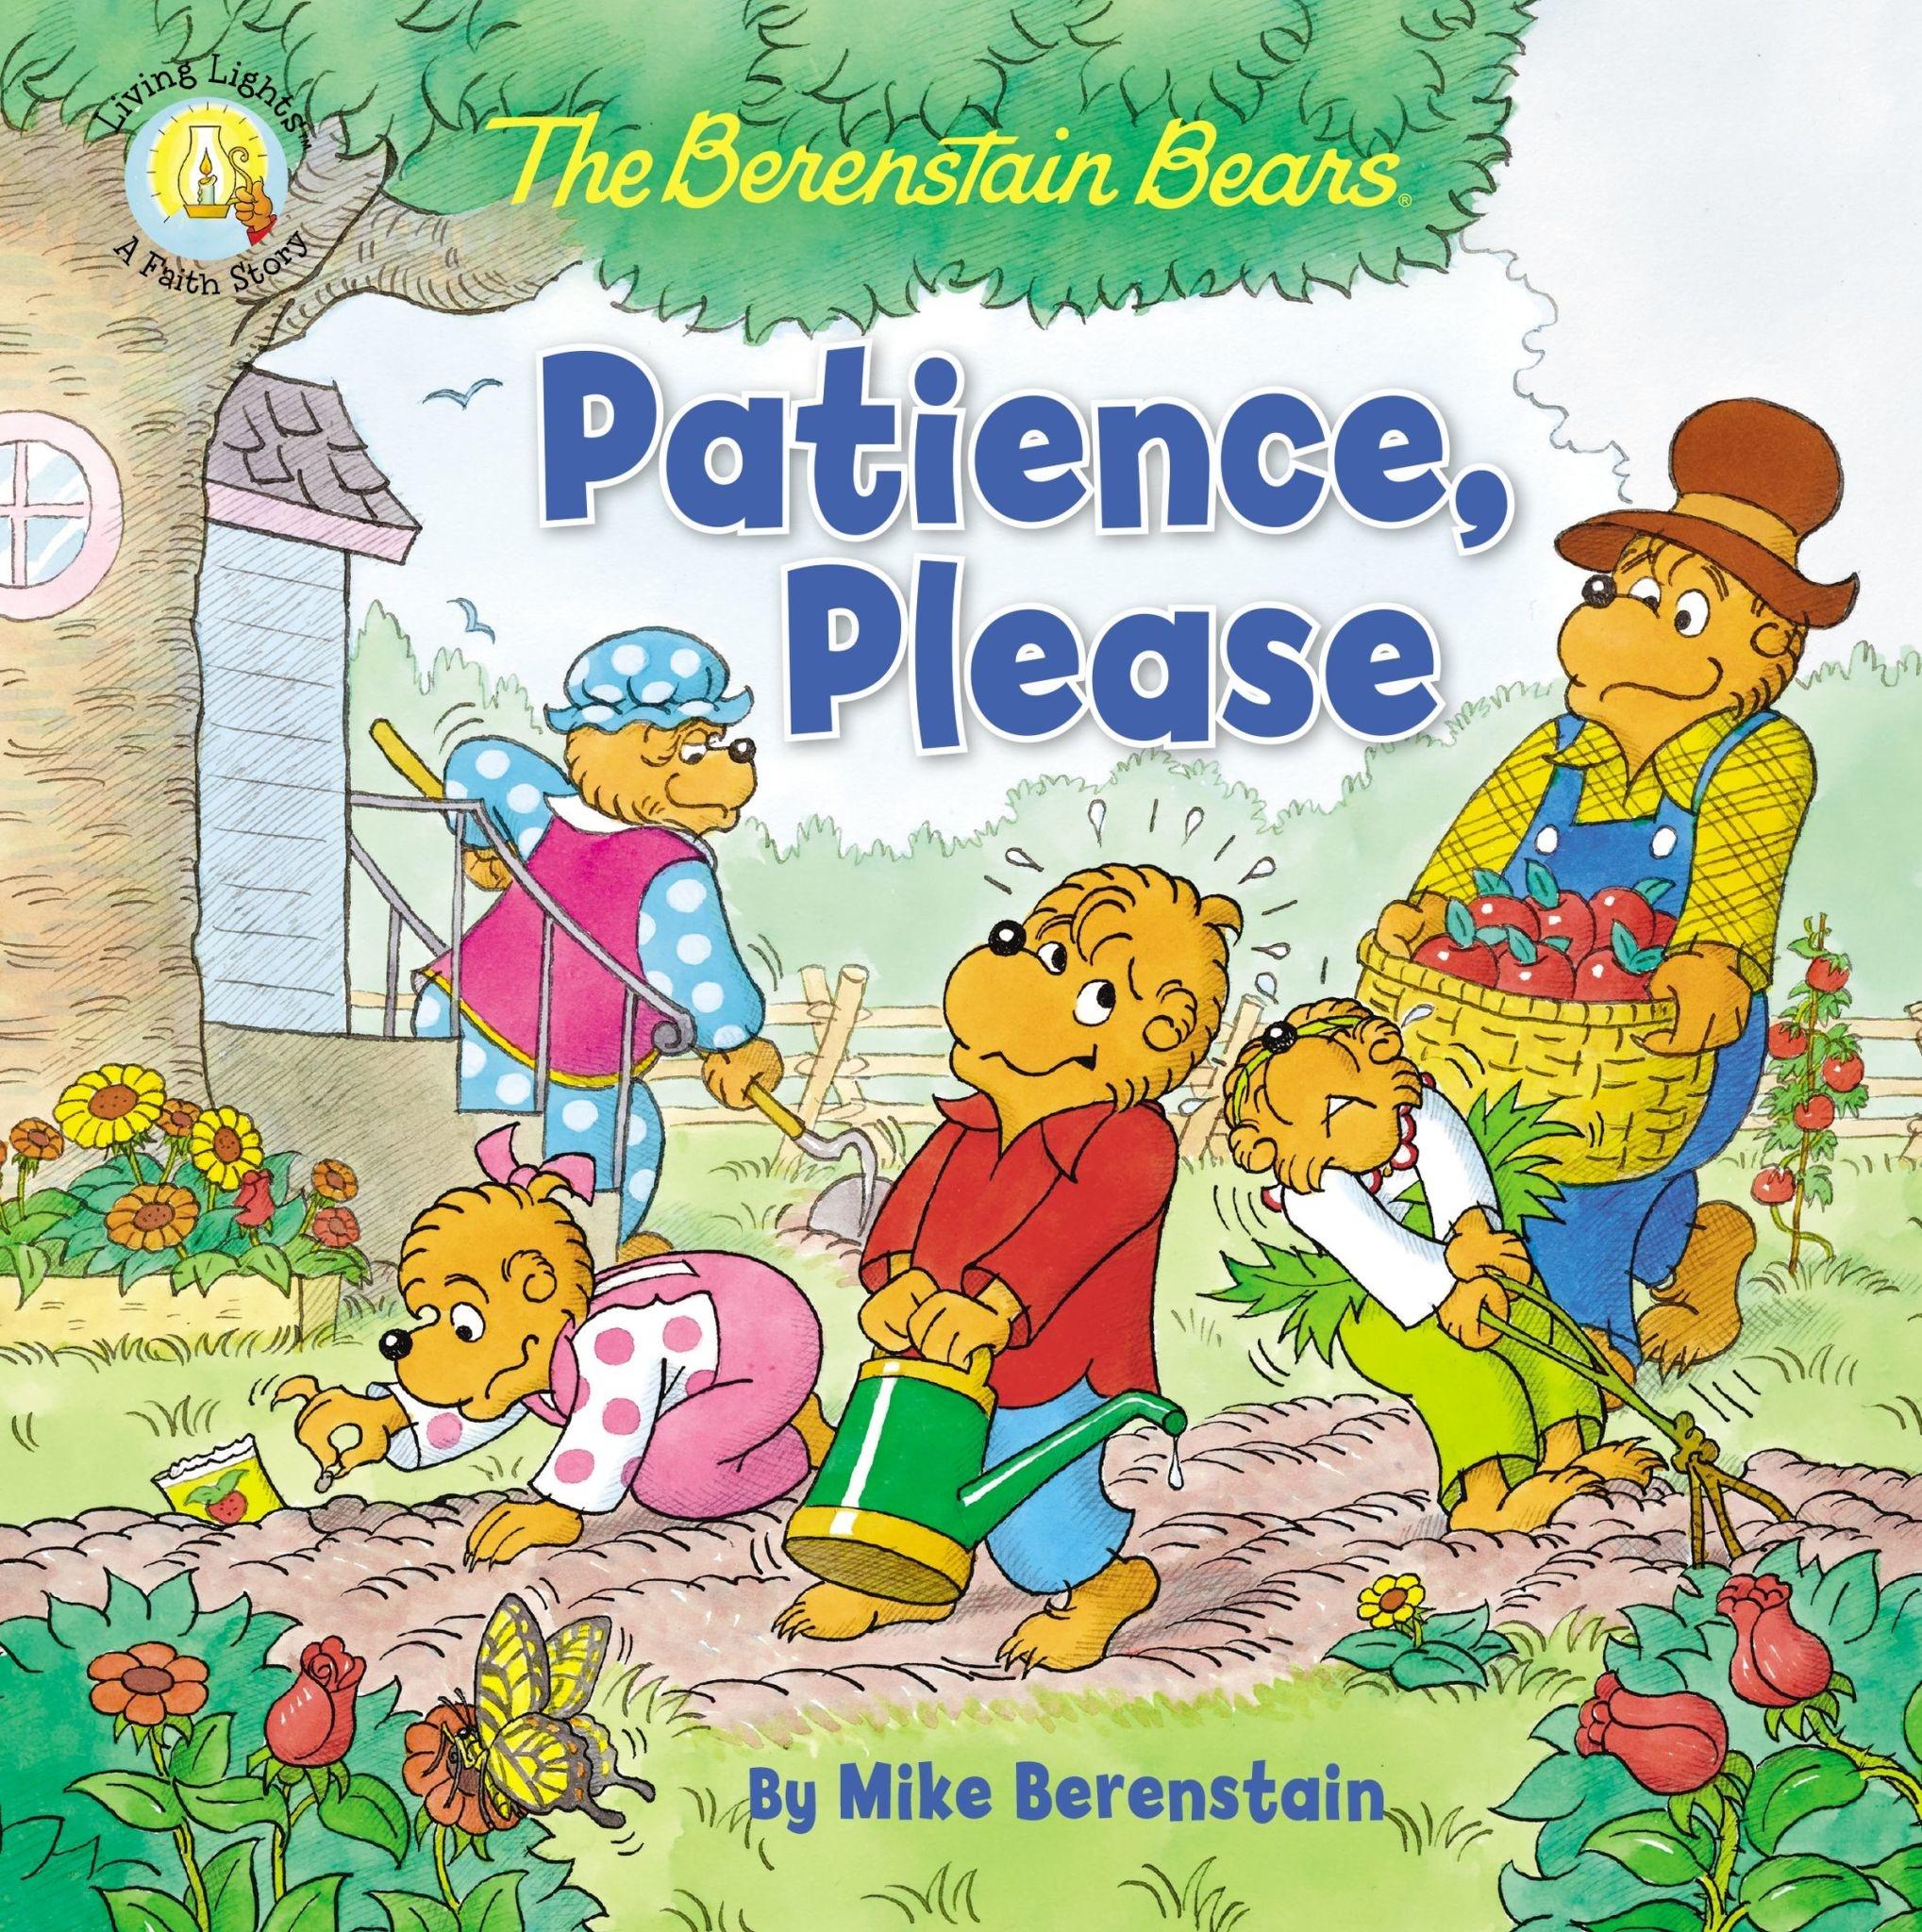 JAN BERENSTAIN The Berenstain Bears Patience, Please